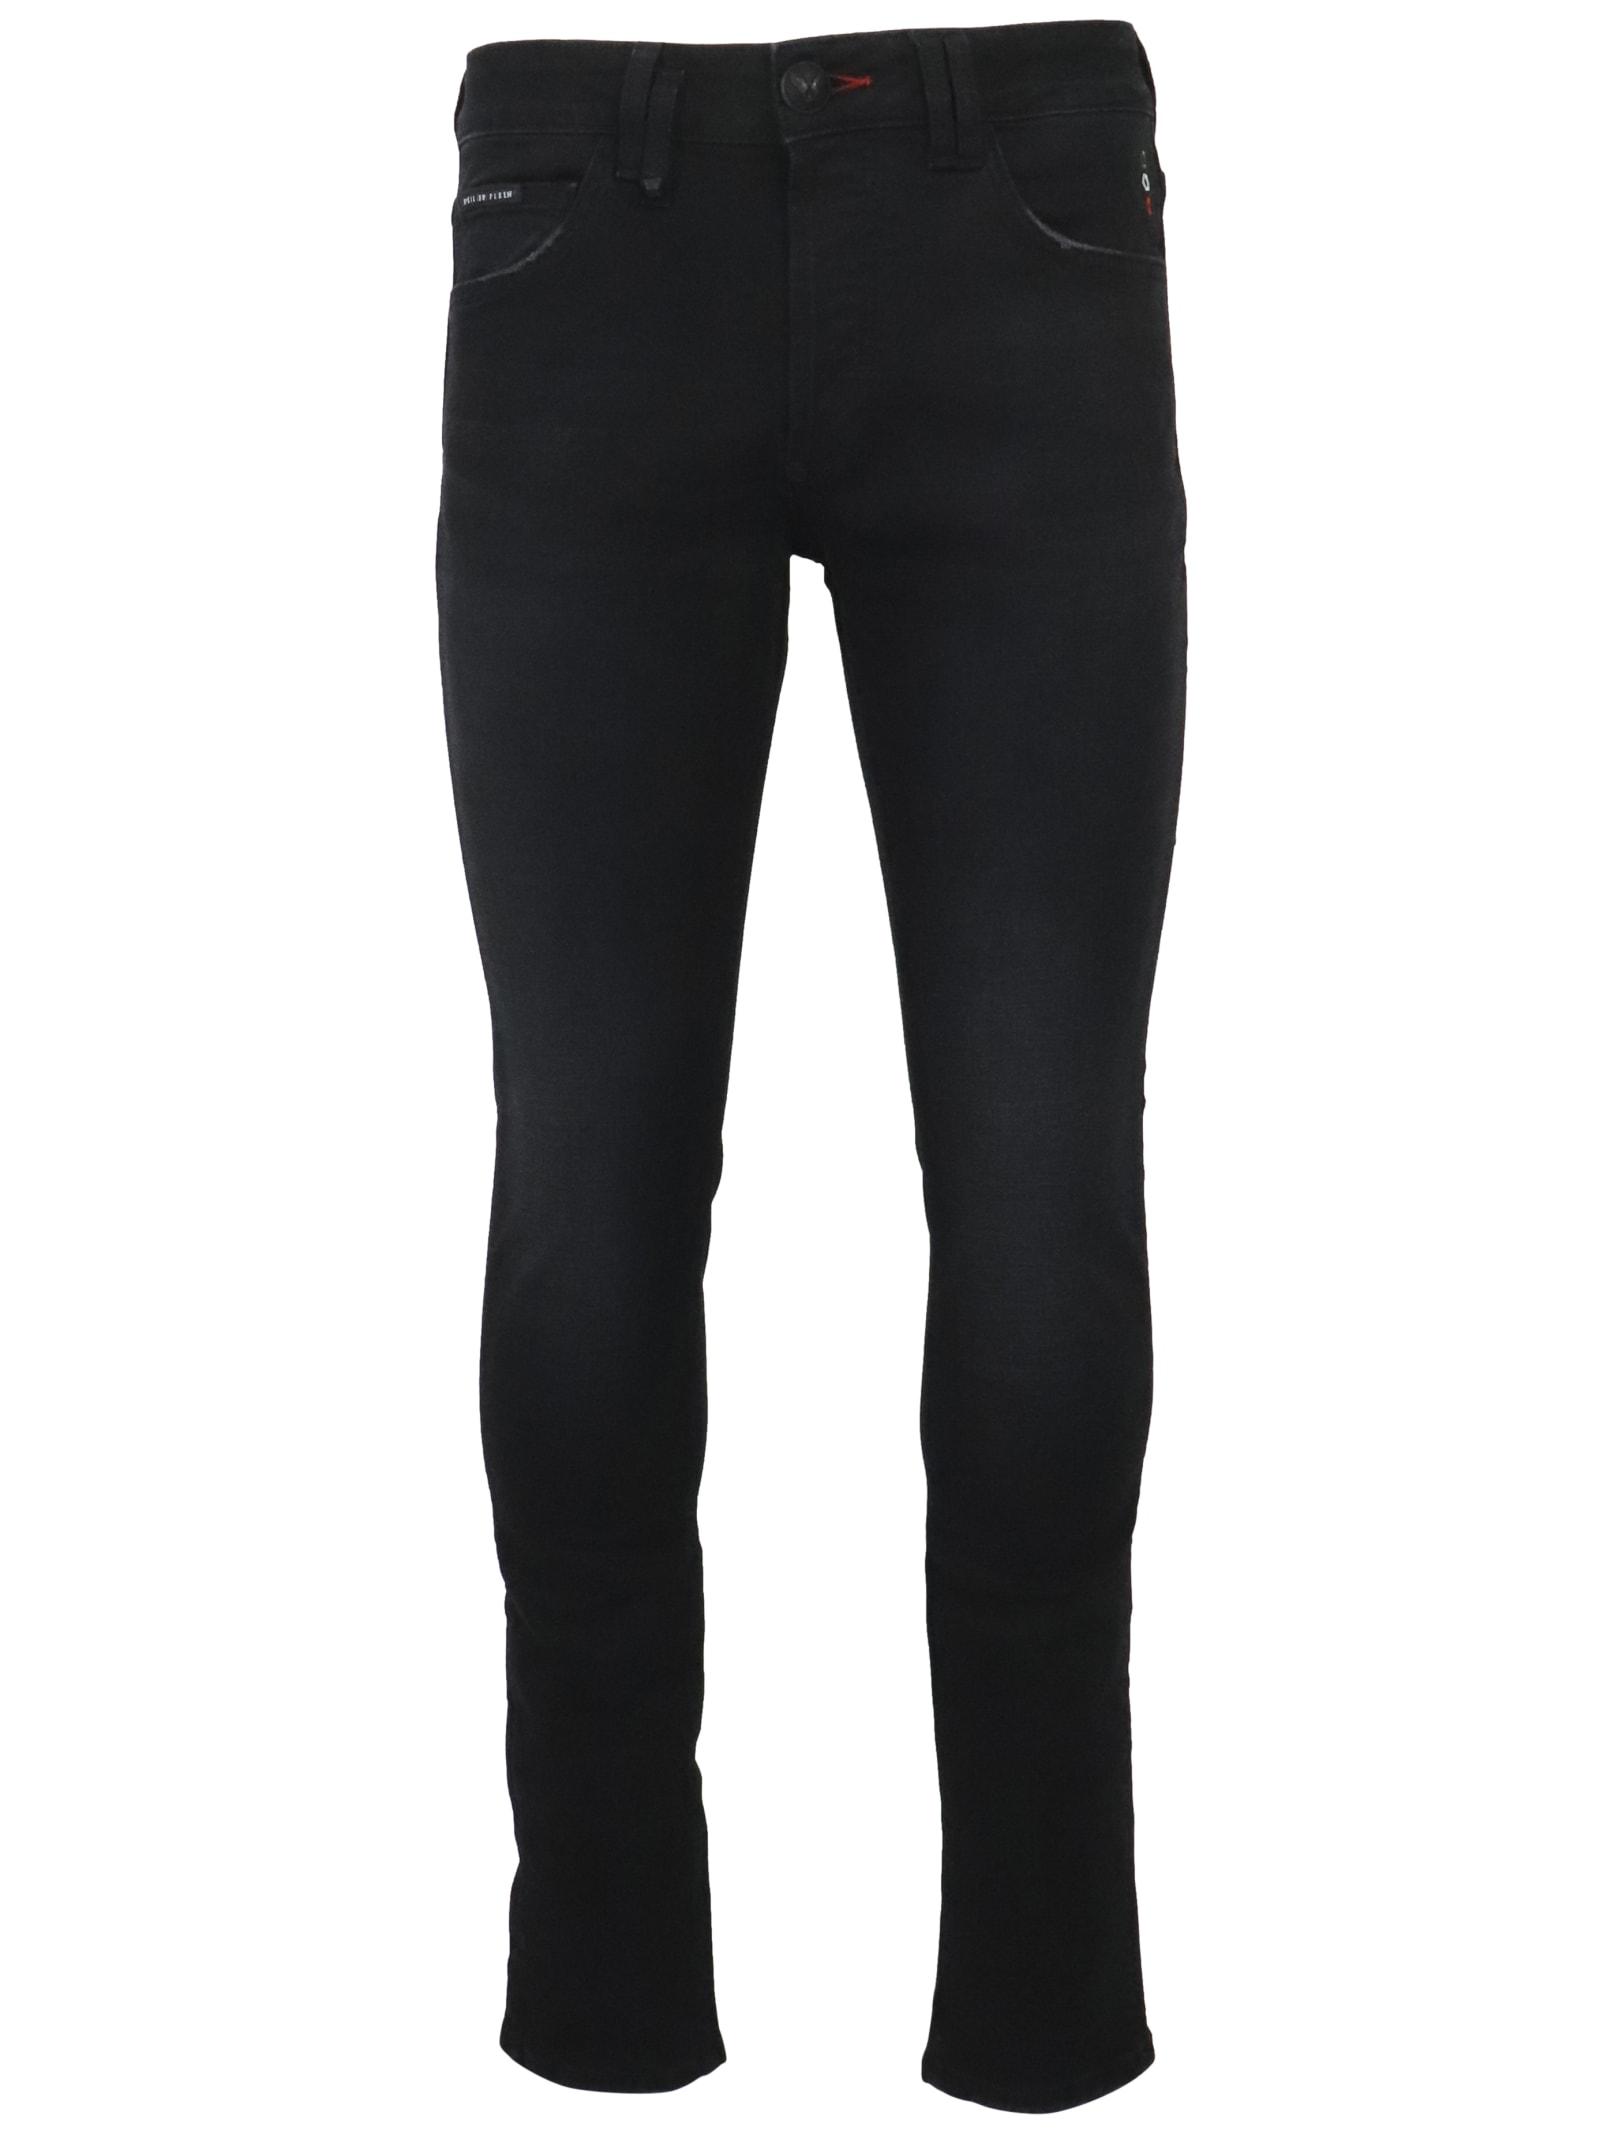 Philipp Plein Straight Supreme Istitut Jeans